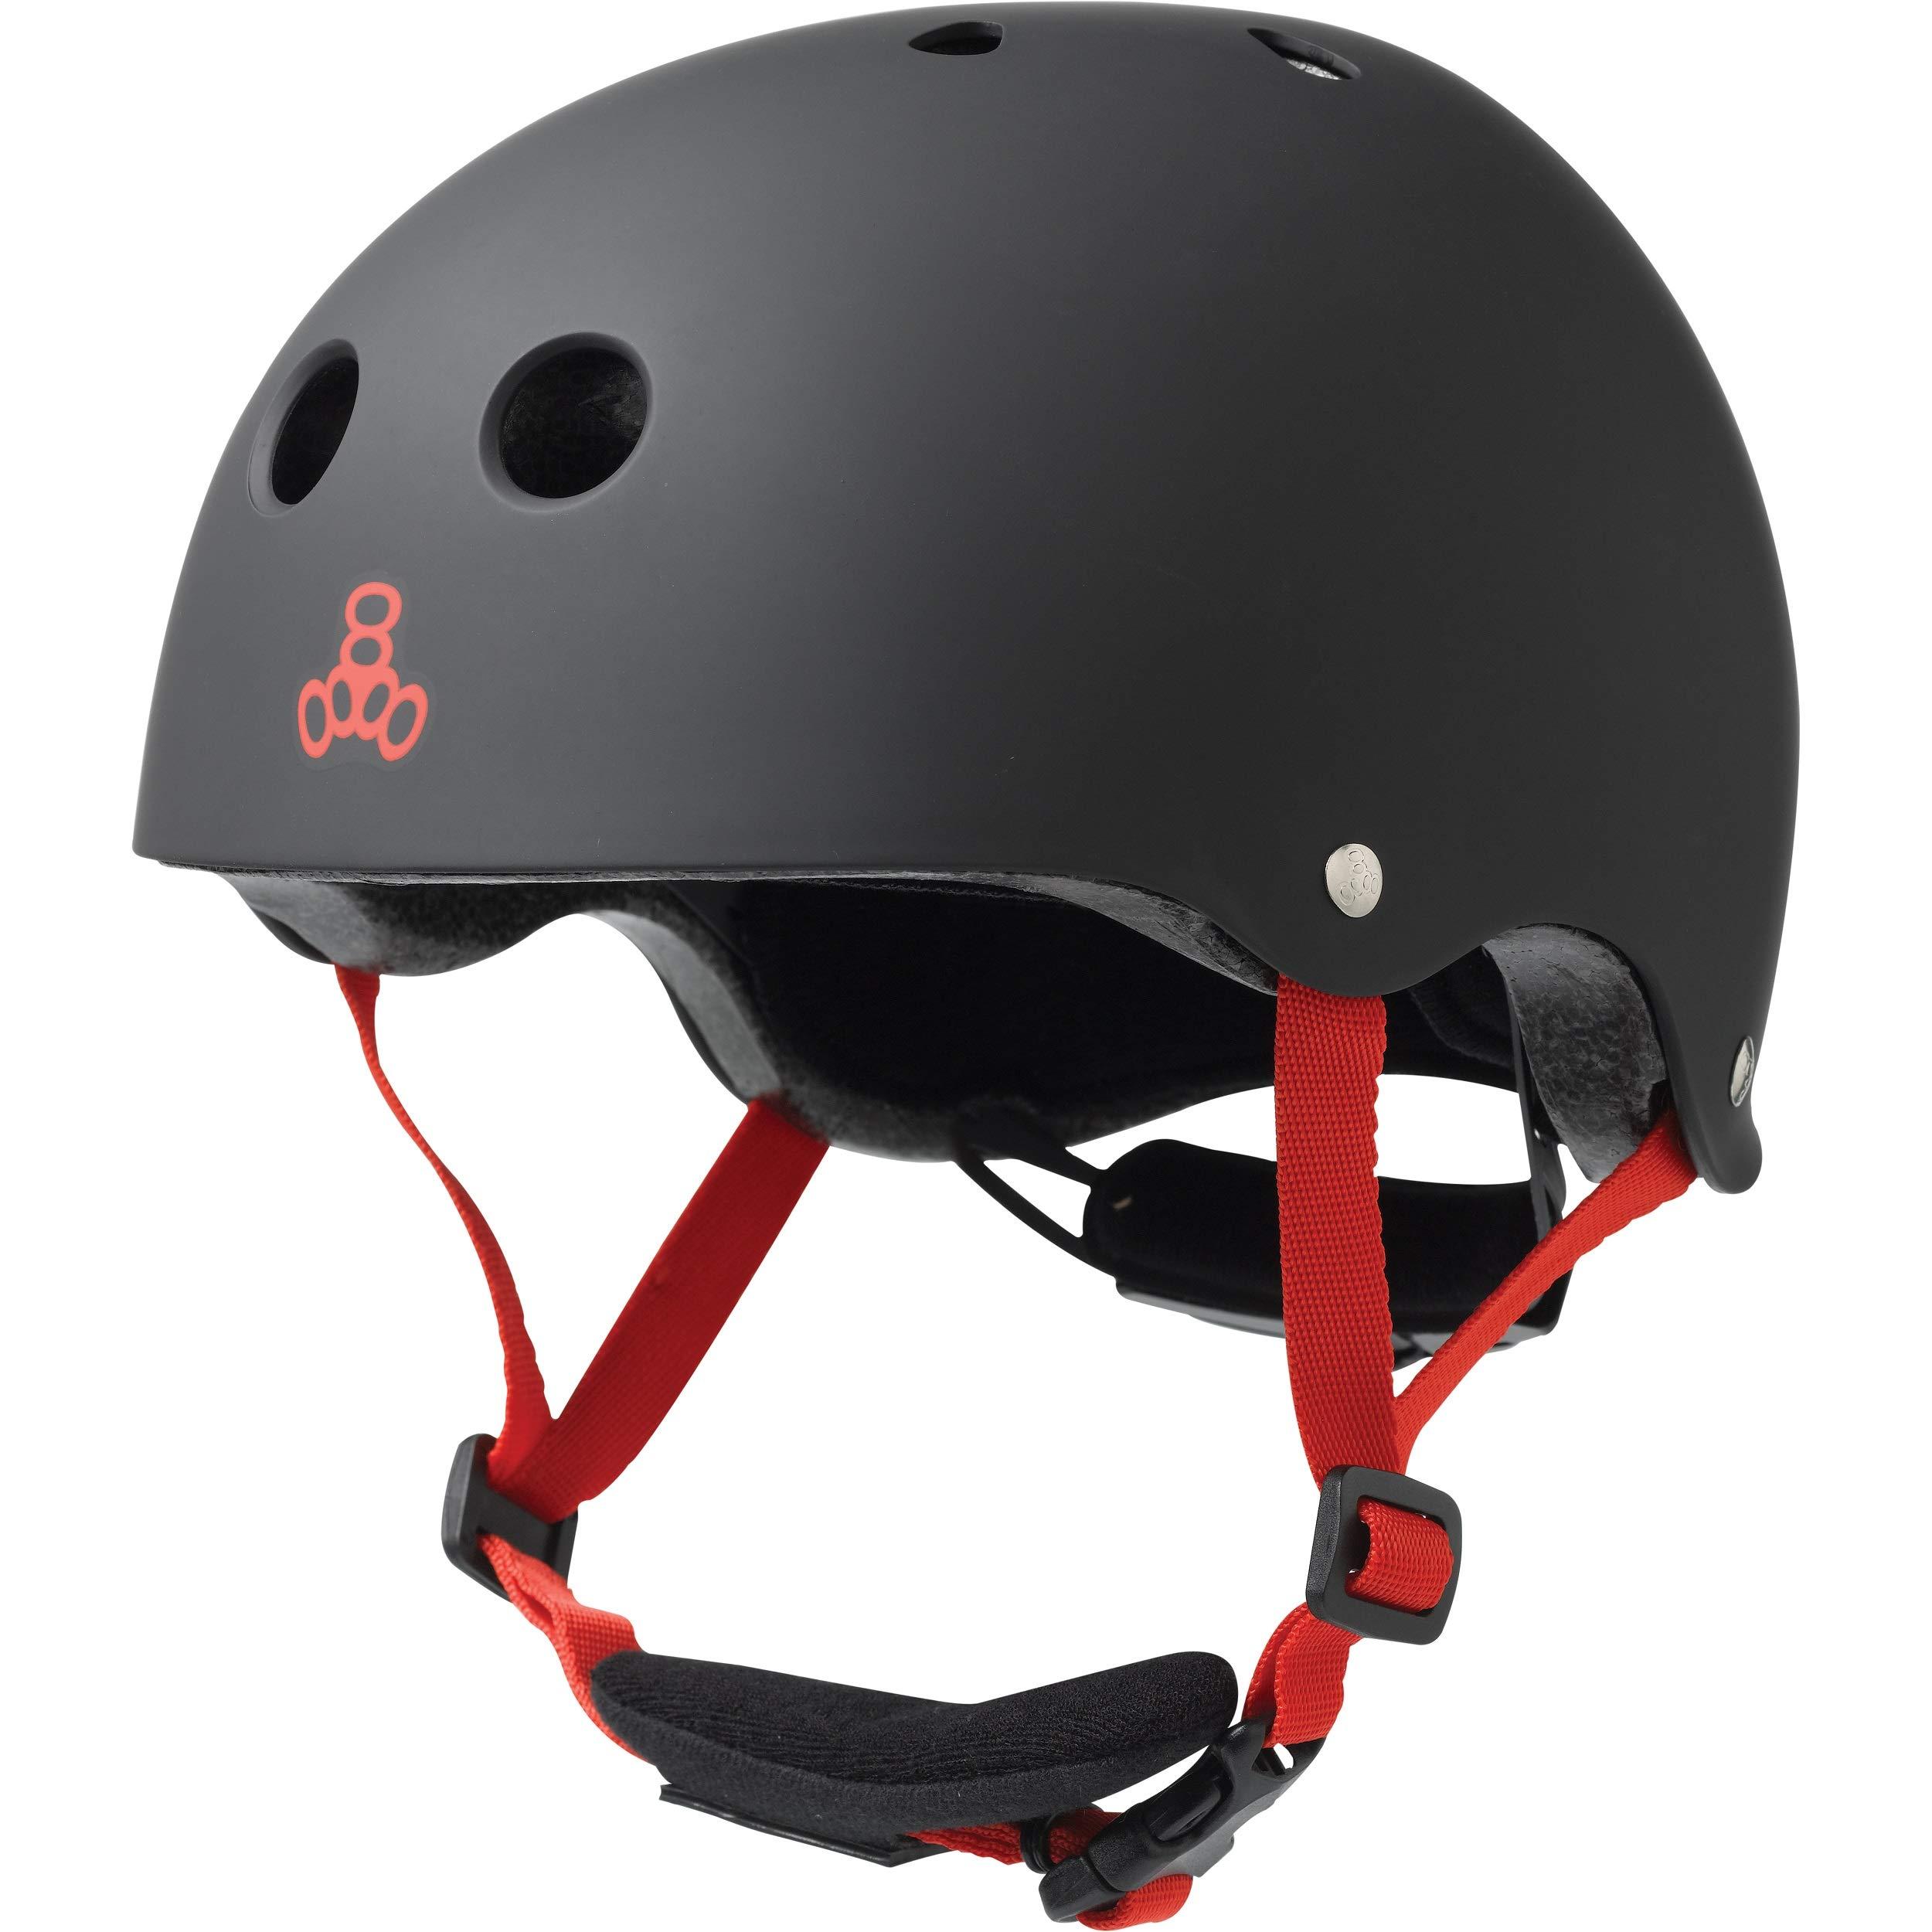 Triple Eight Lil 8 Dual Certified Sweatsaver Kids Skateboard and Bike Helmet with Padded Chin Buckle, Black Rubber by Triple Eight